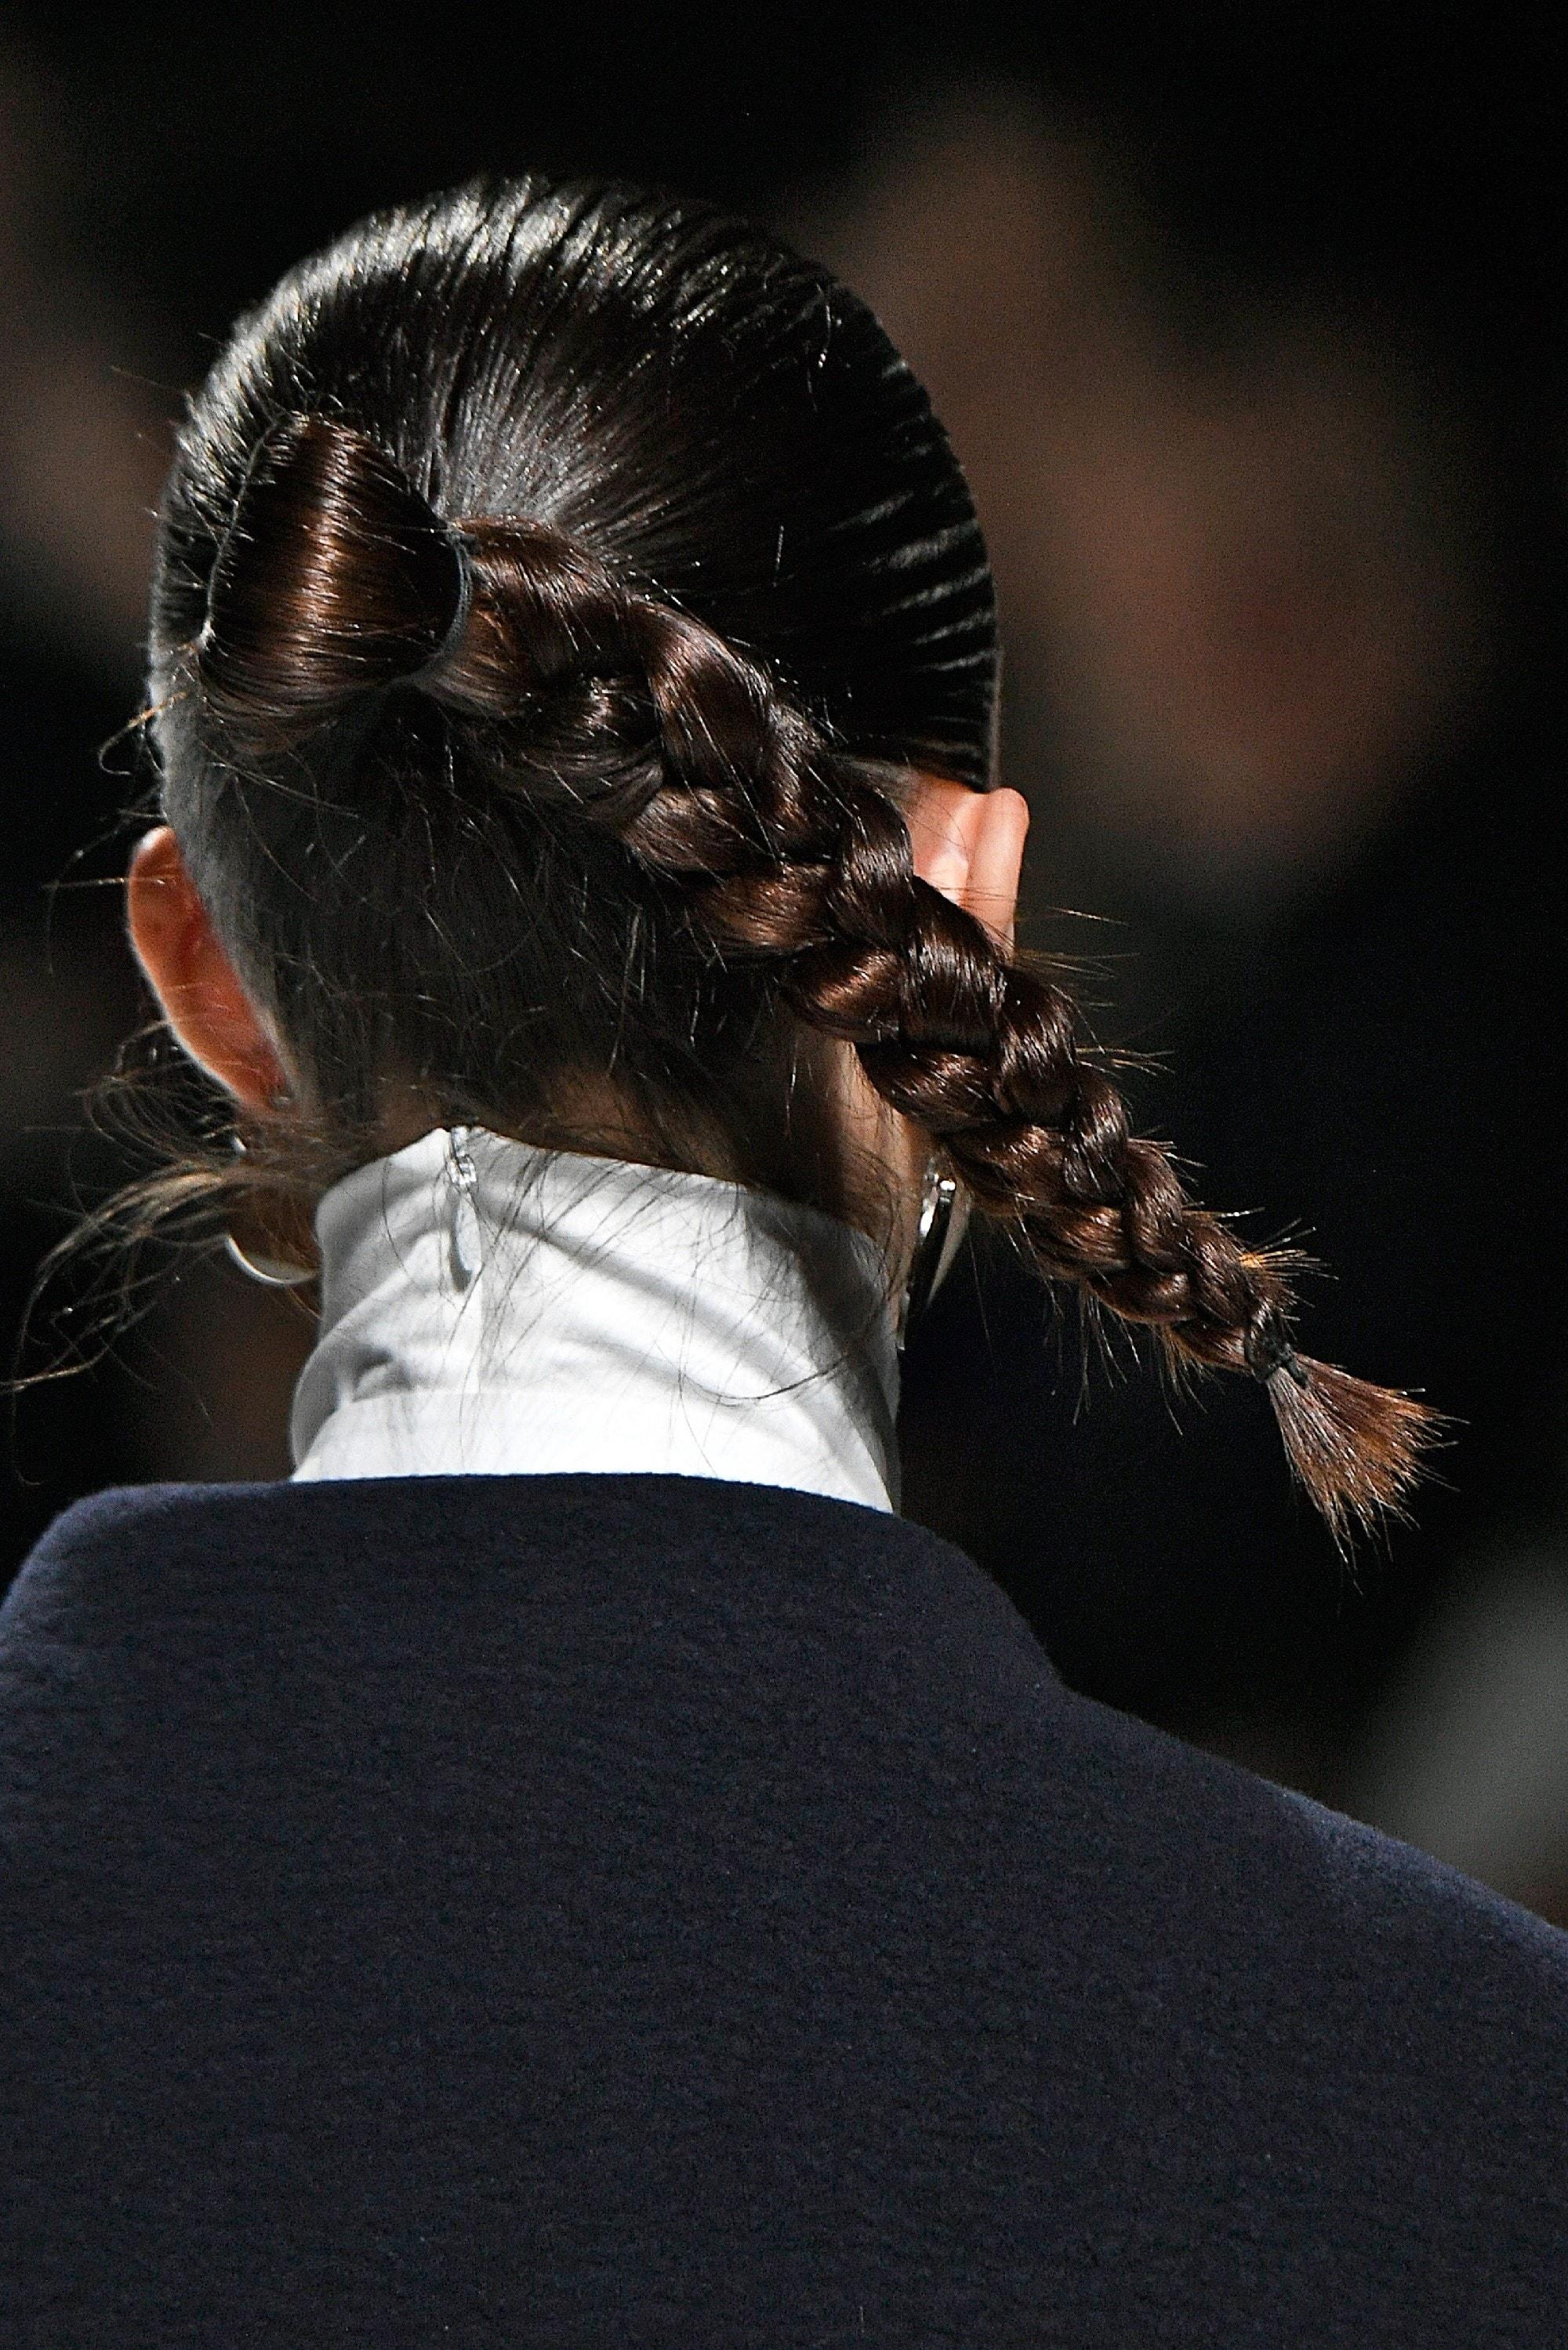 Queen Elsa hair ideas - Gravity-defying braid Indigital